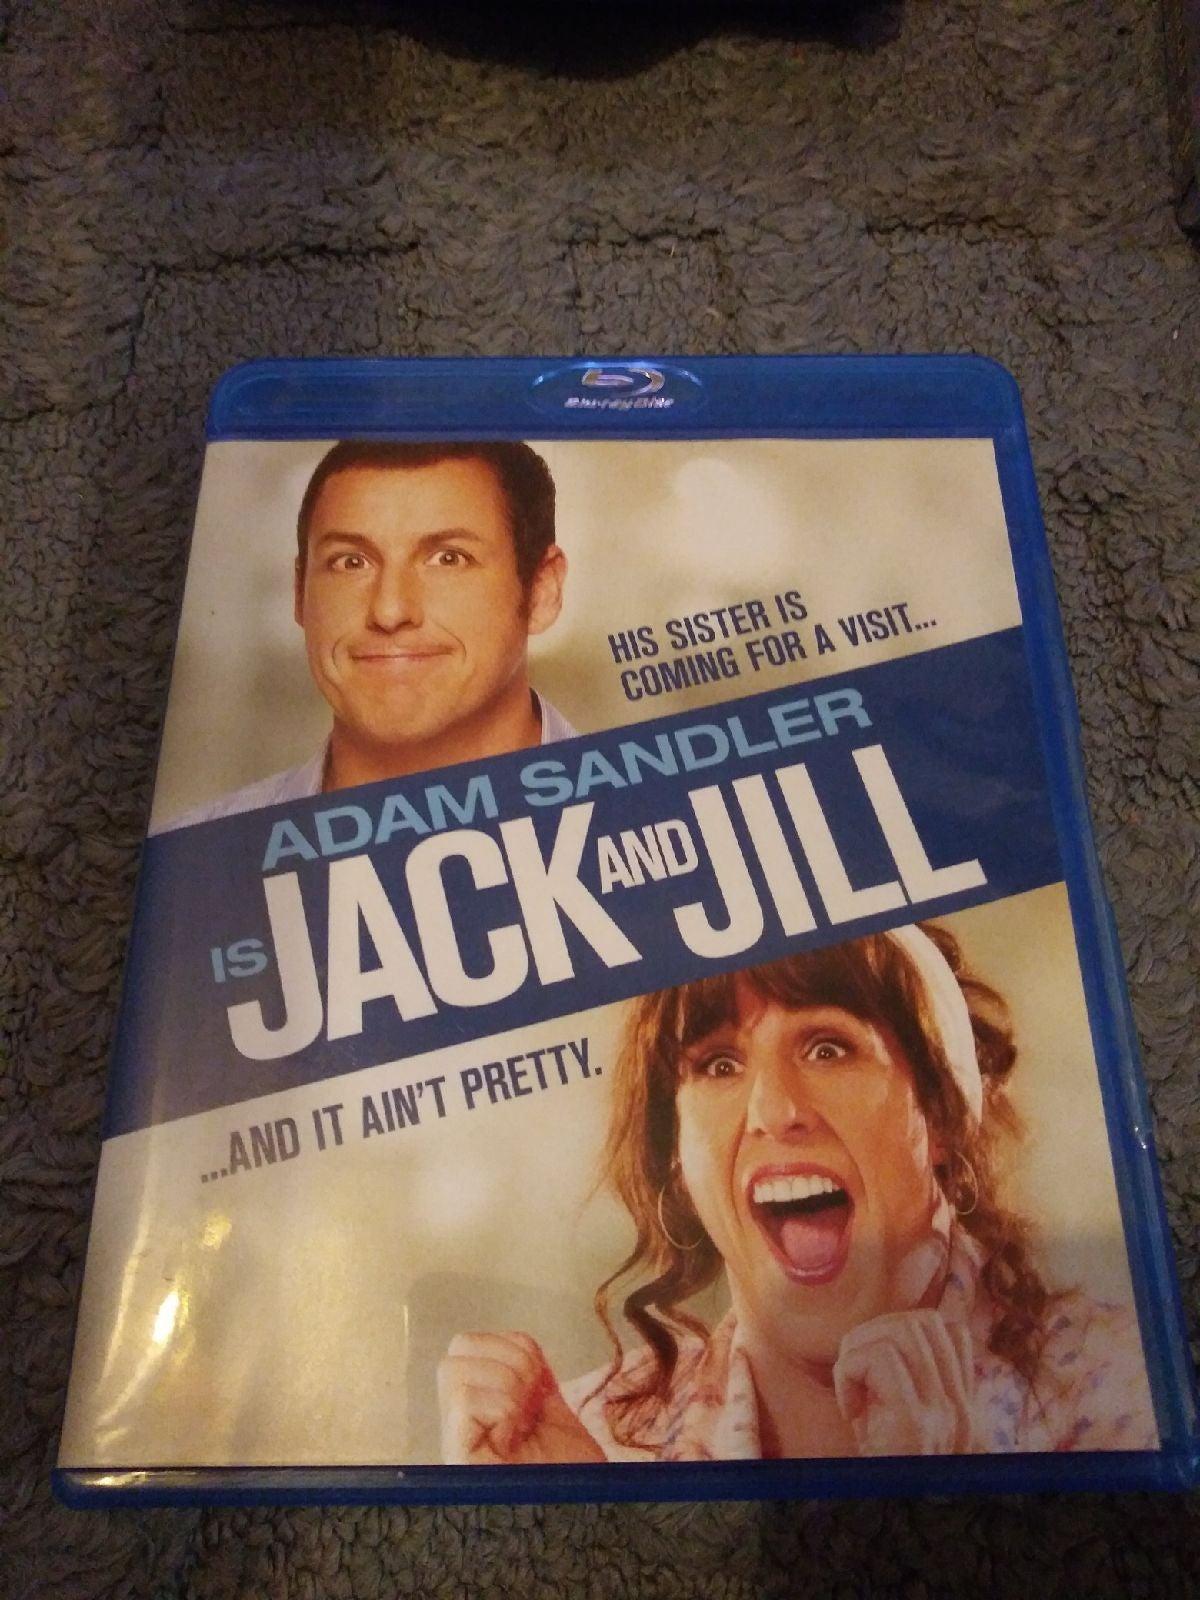 Adam sandler is jack and jill blu ray